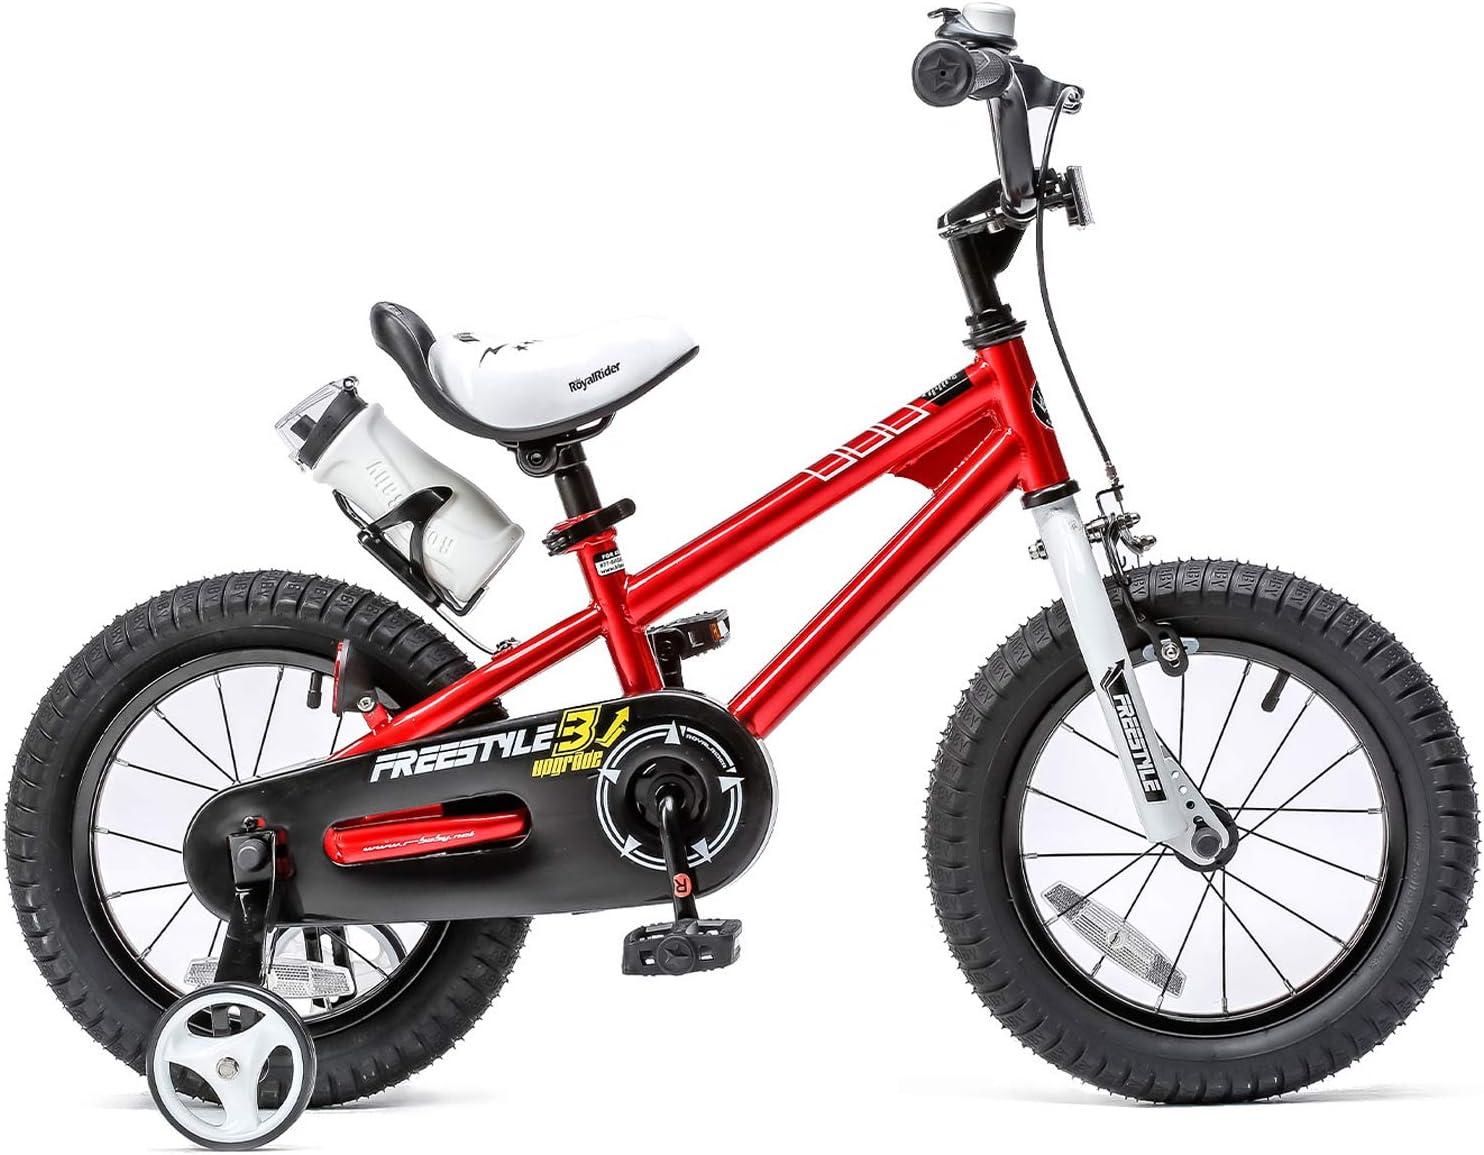 RoyalBaby Kids Bike Boys Girls Freestyle Bicycle 12 14 16 inch with Training Wheels,16 18 20 inch with Kickstand Childs Bike Blue Red Orange Green Pink White Fuchsia